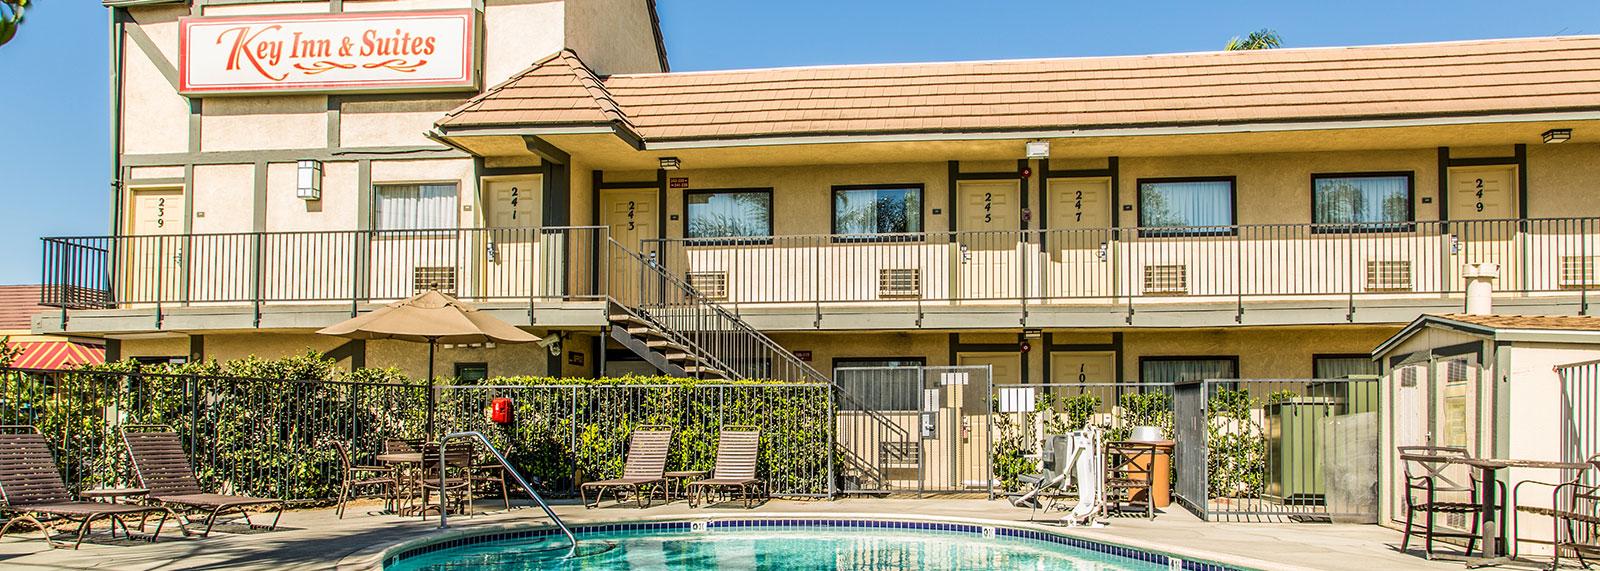 key-inn-and-suites-tustin-california-top